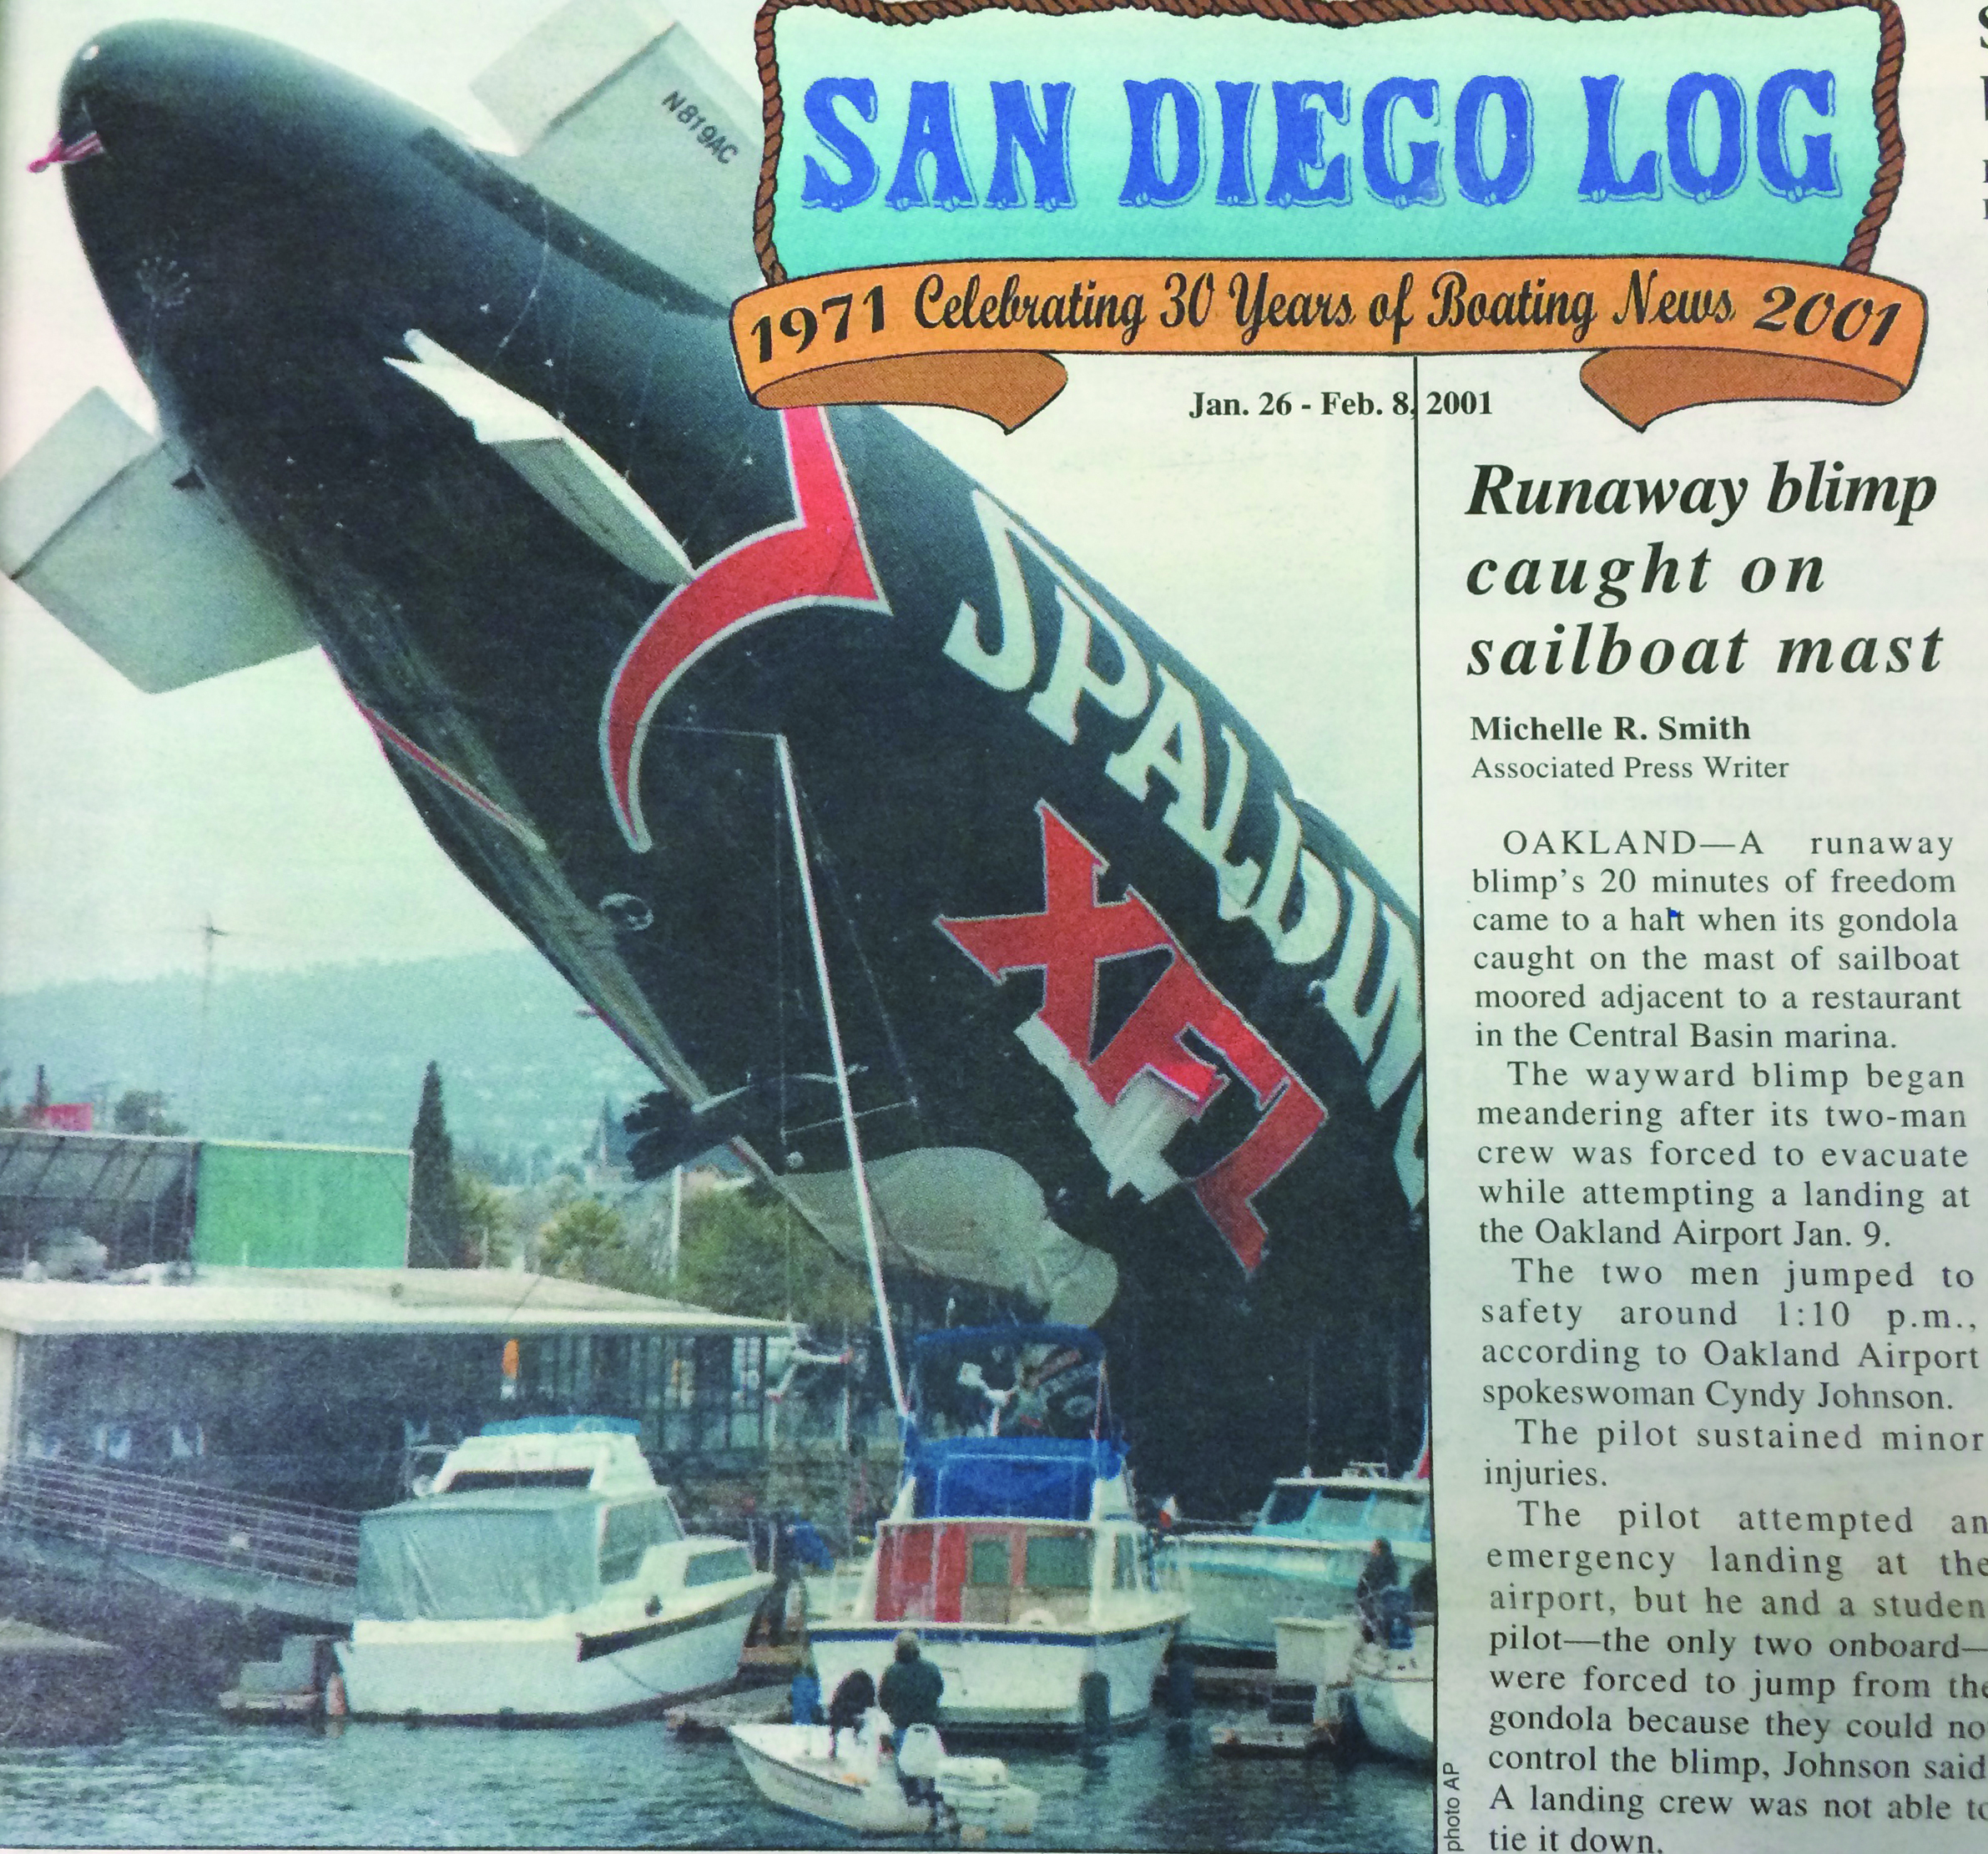 2001: Runaway blimp caught on sailboat mast